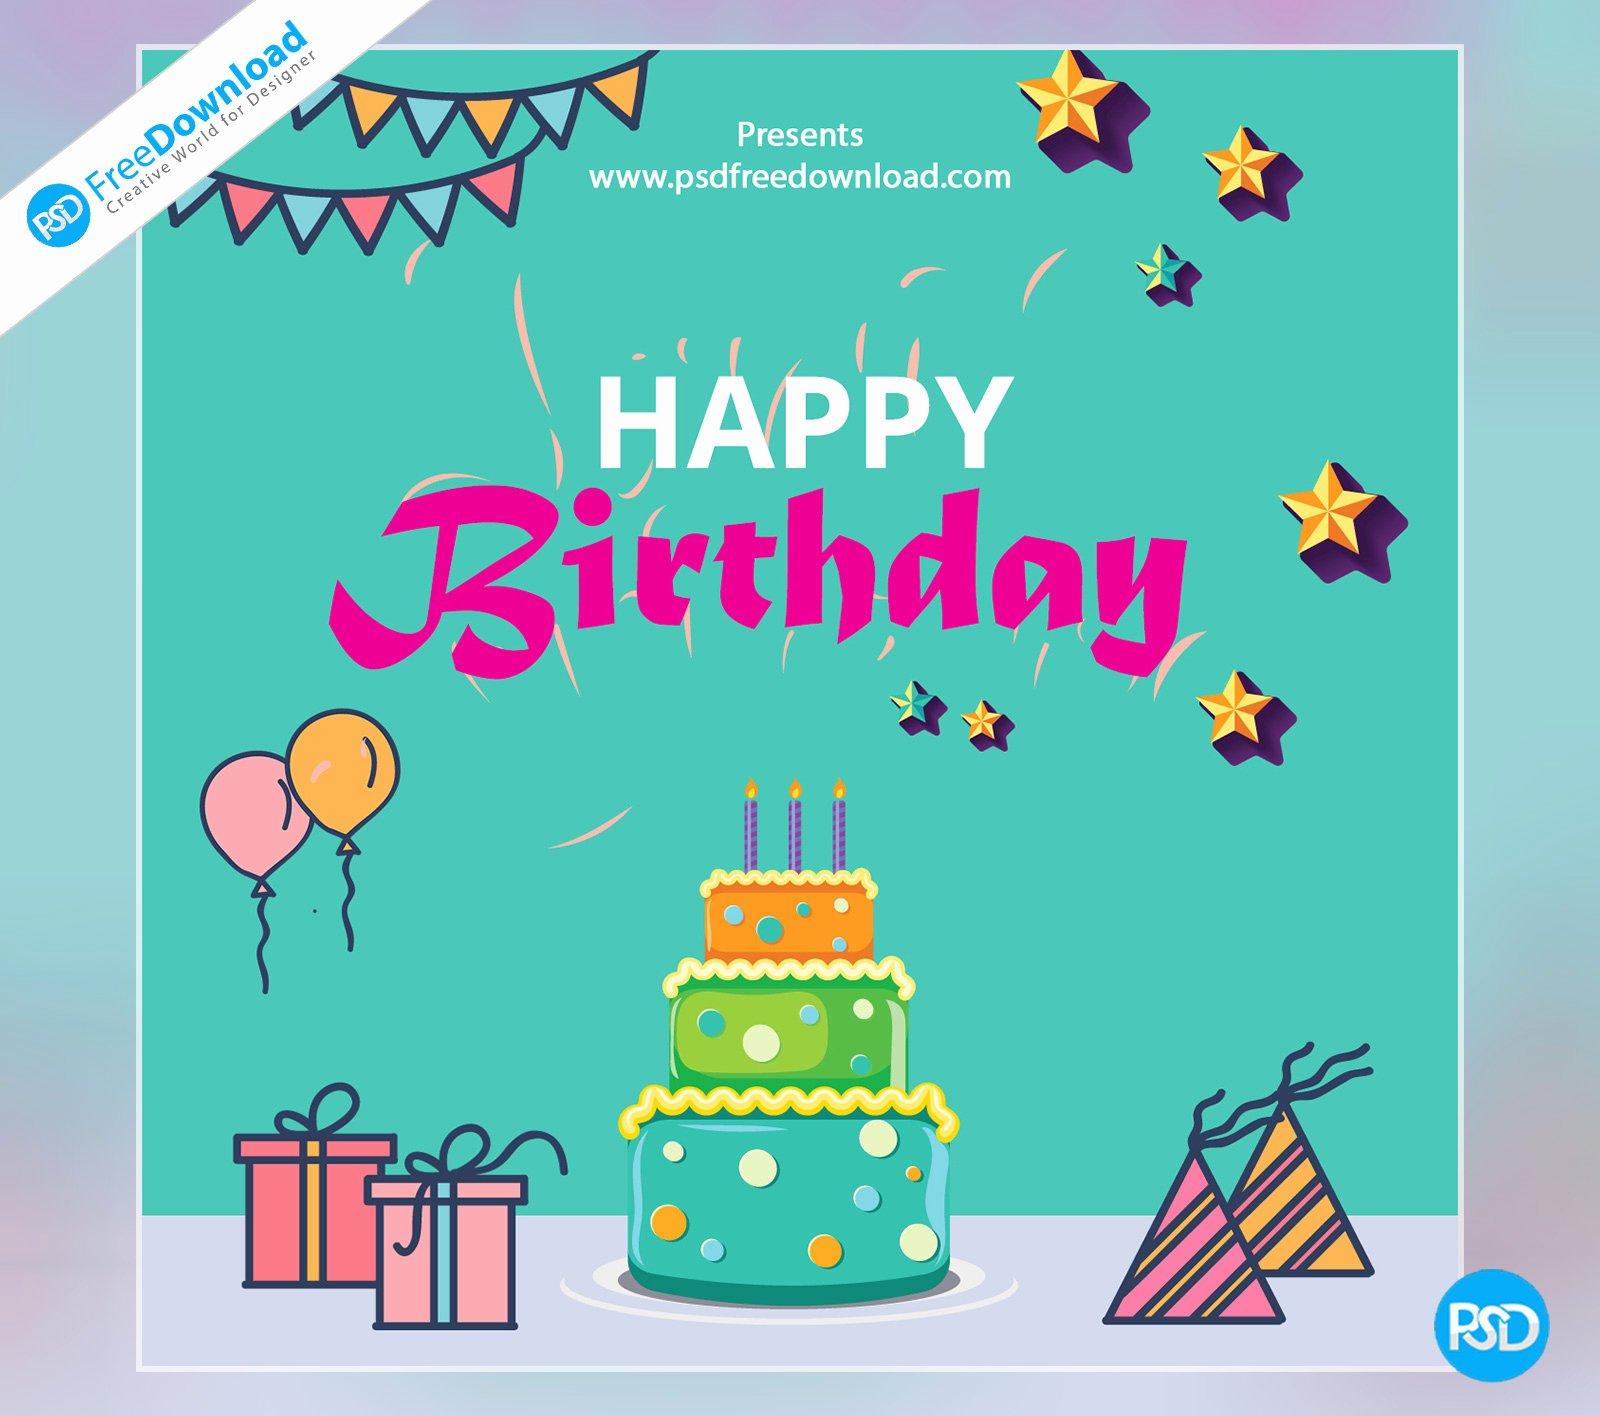 Free Happy Birthday Templates Inspirational Happy Birthday Template Greeting Card Psd Free Download